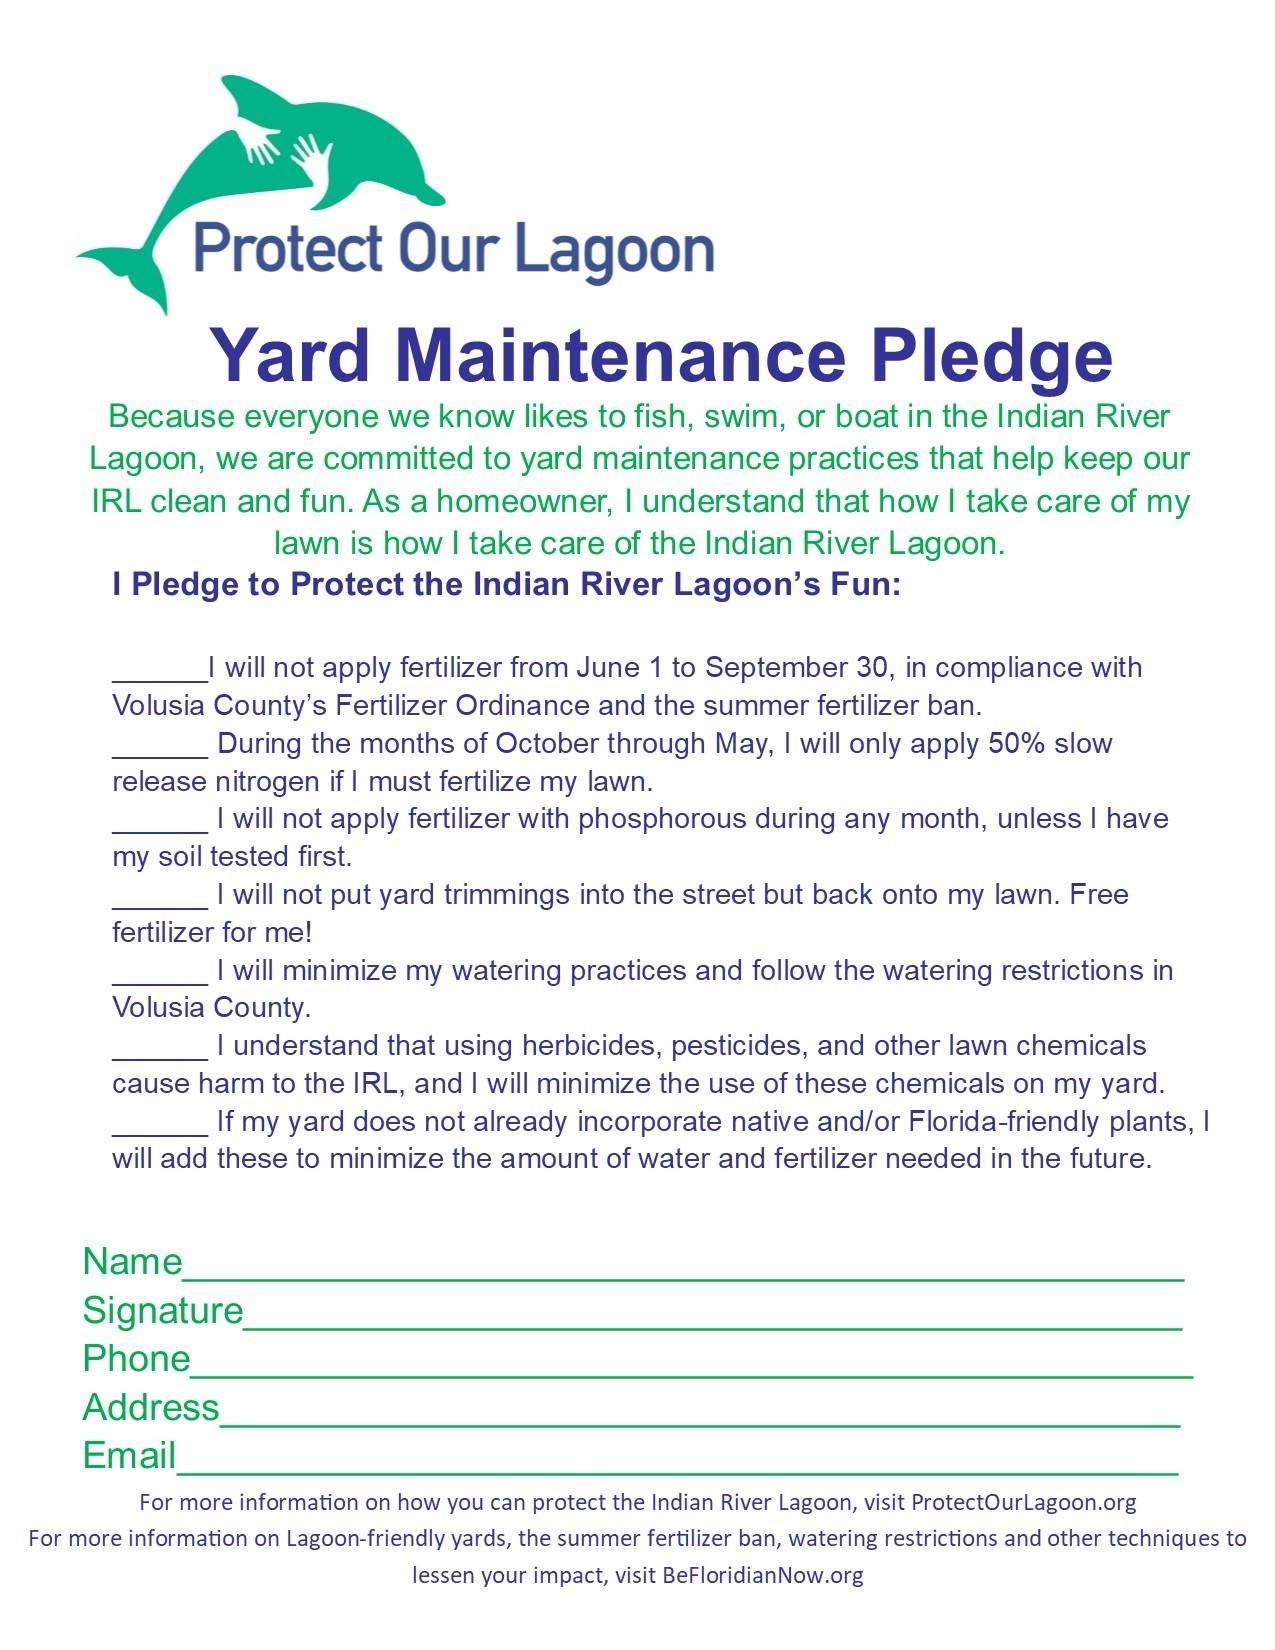 POL Yard Pledge.jpg